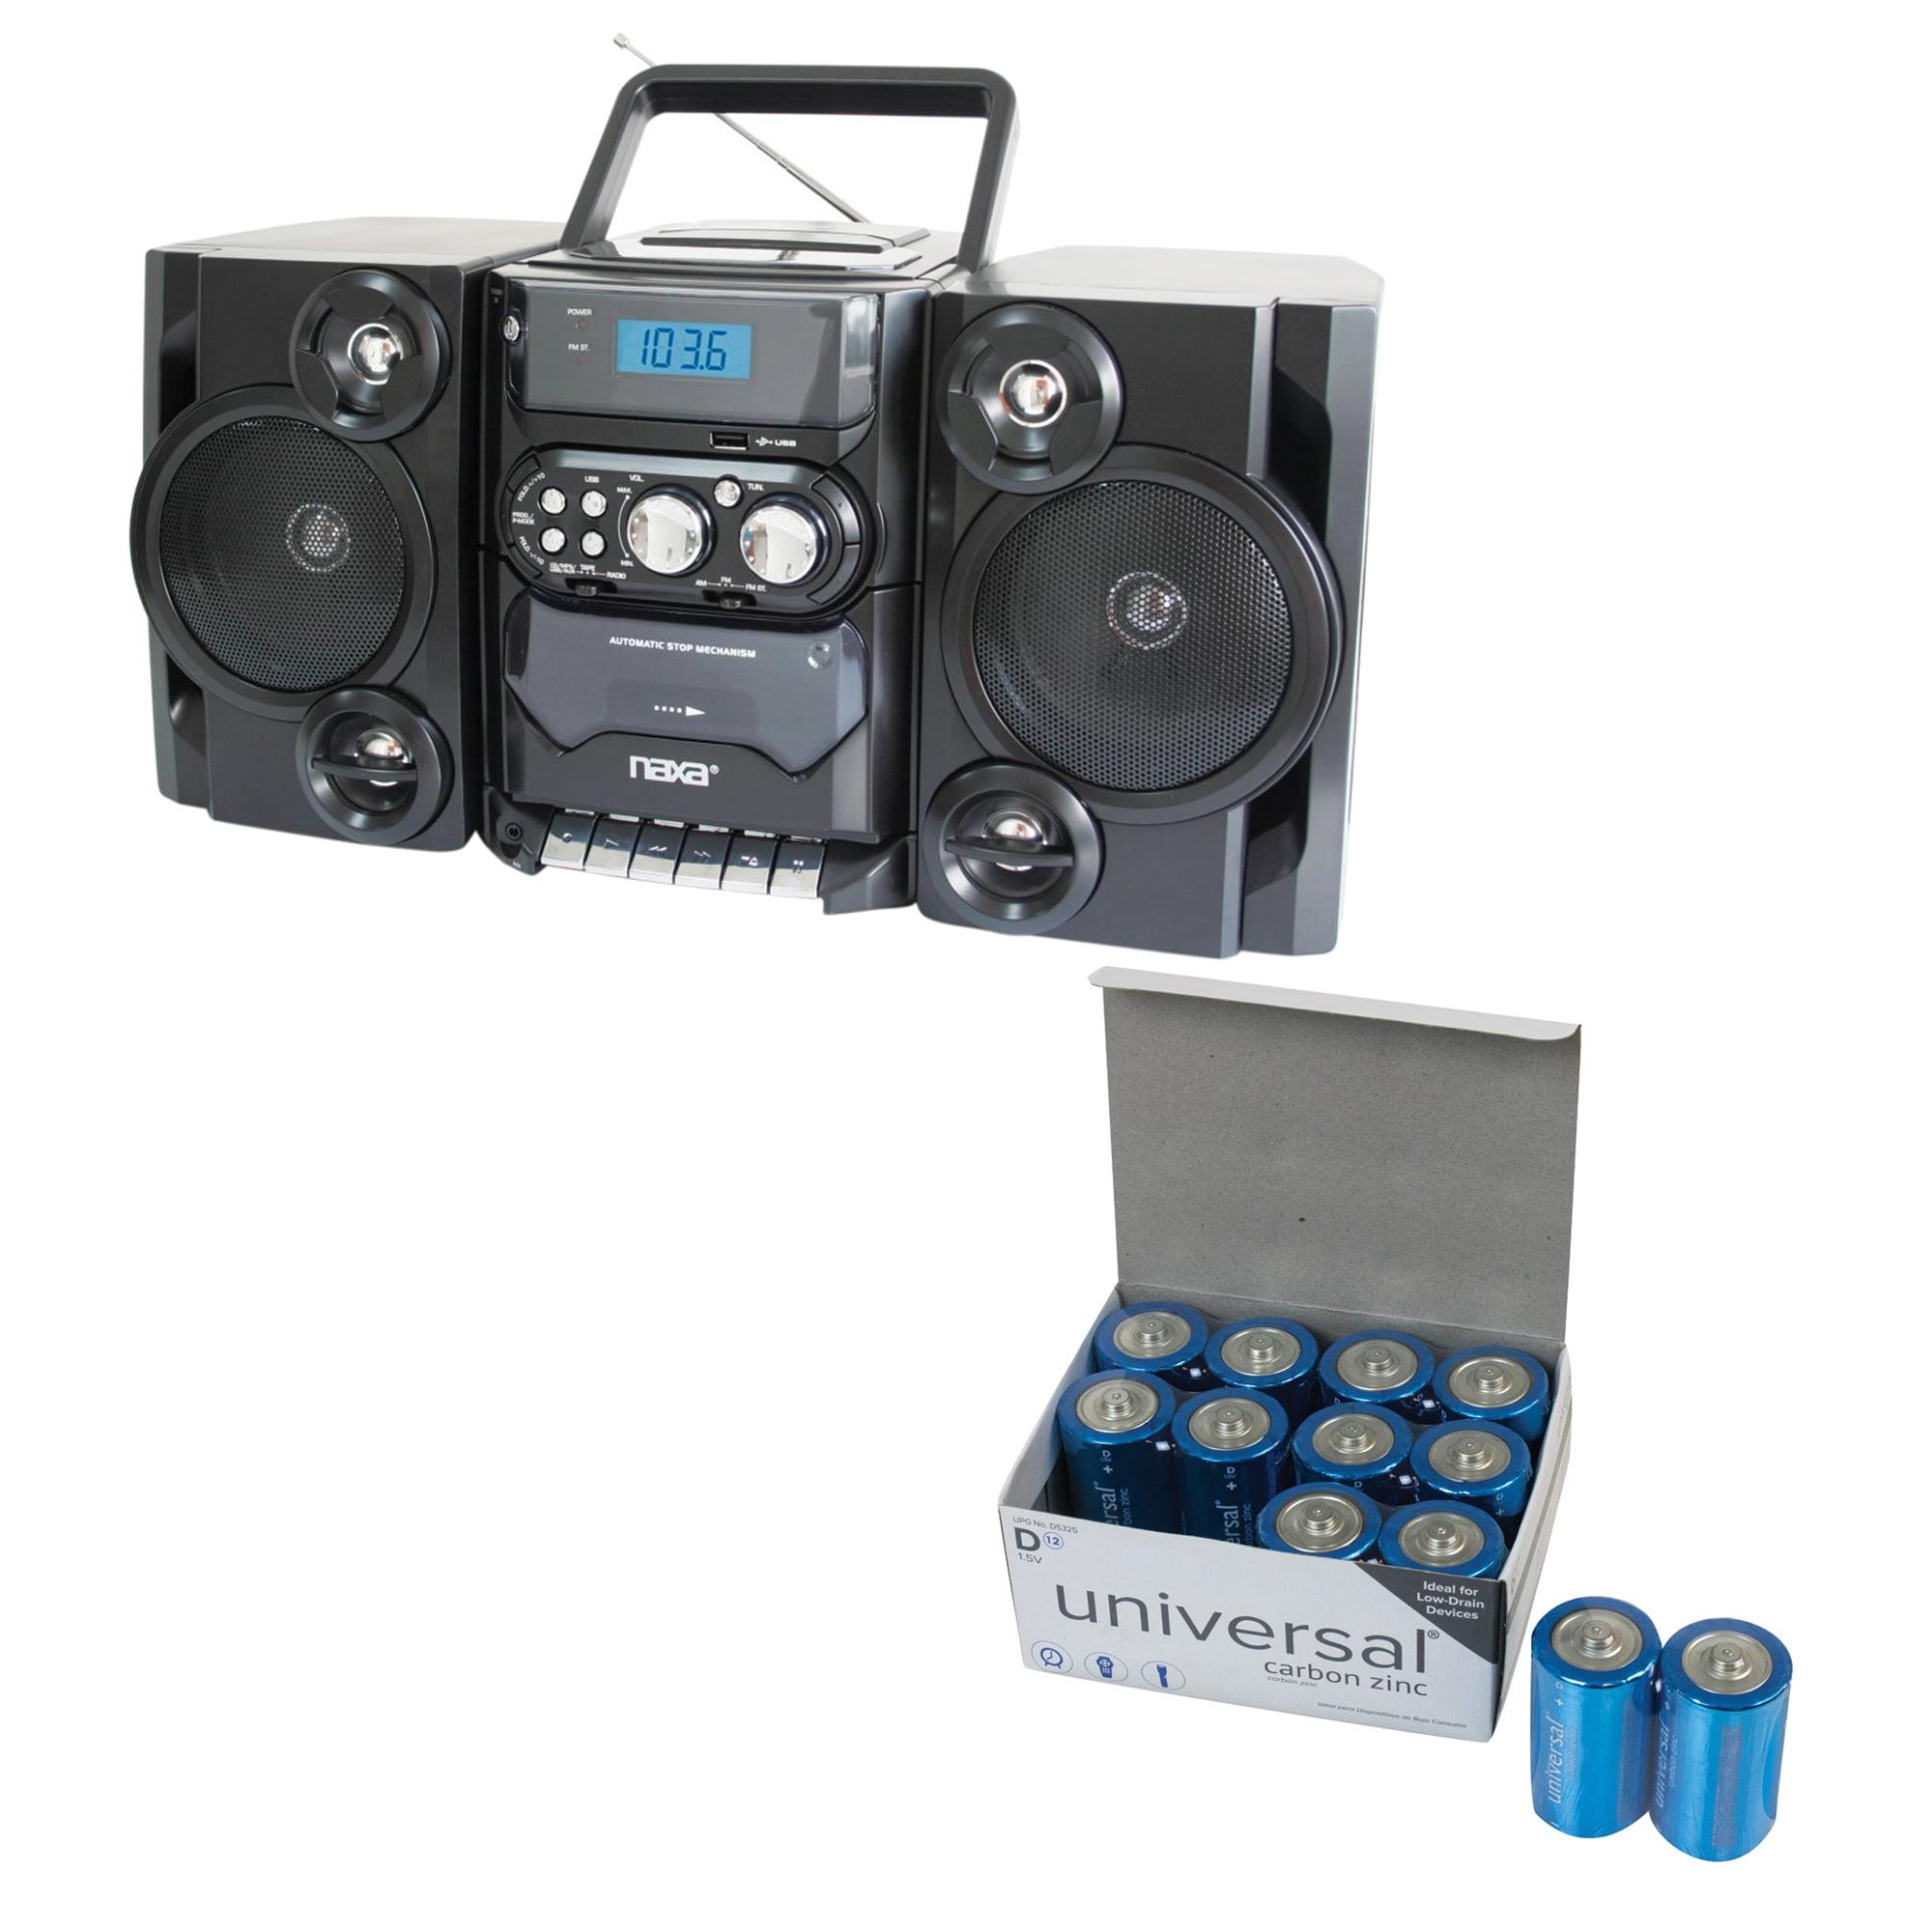 Naxa NPB428 Portable CD/MP3 Player With AM/FM Radio, Detachable Speakers, Remote & USB Input & UPG D 12 PACK